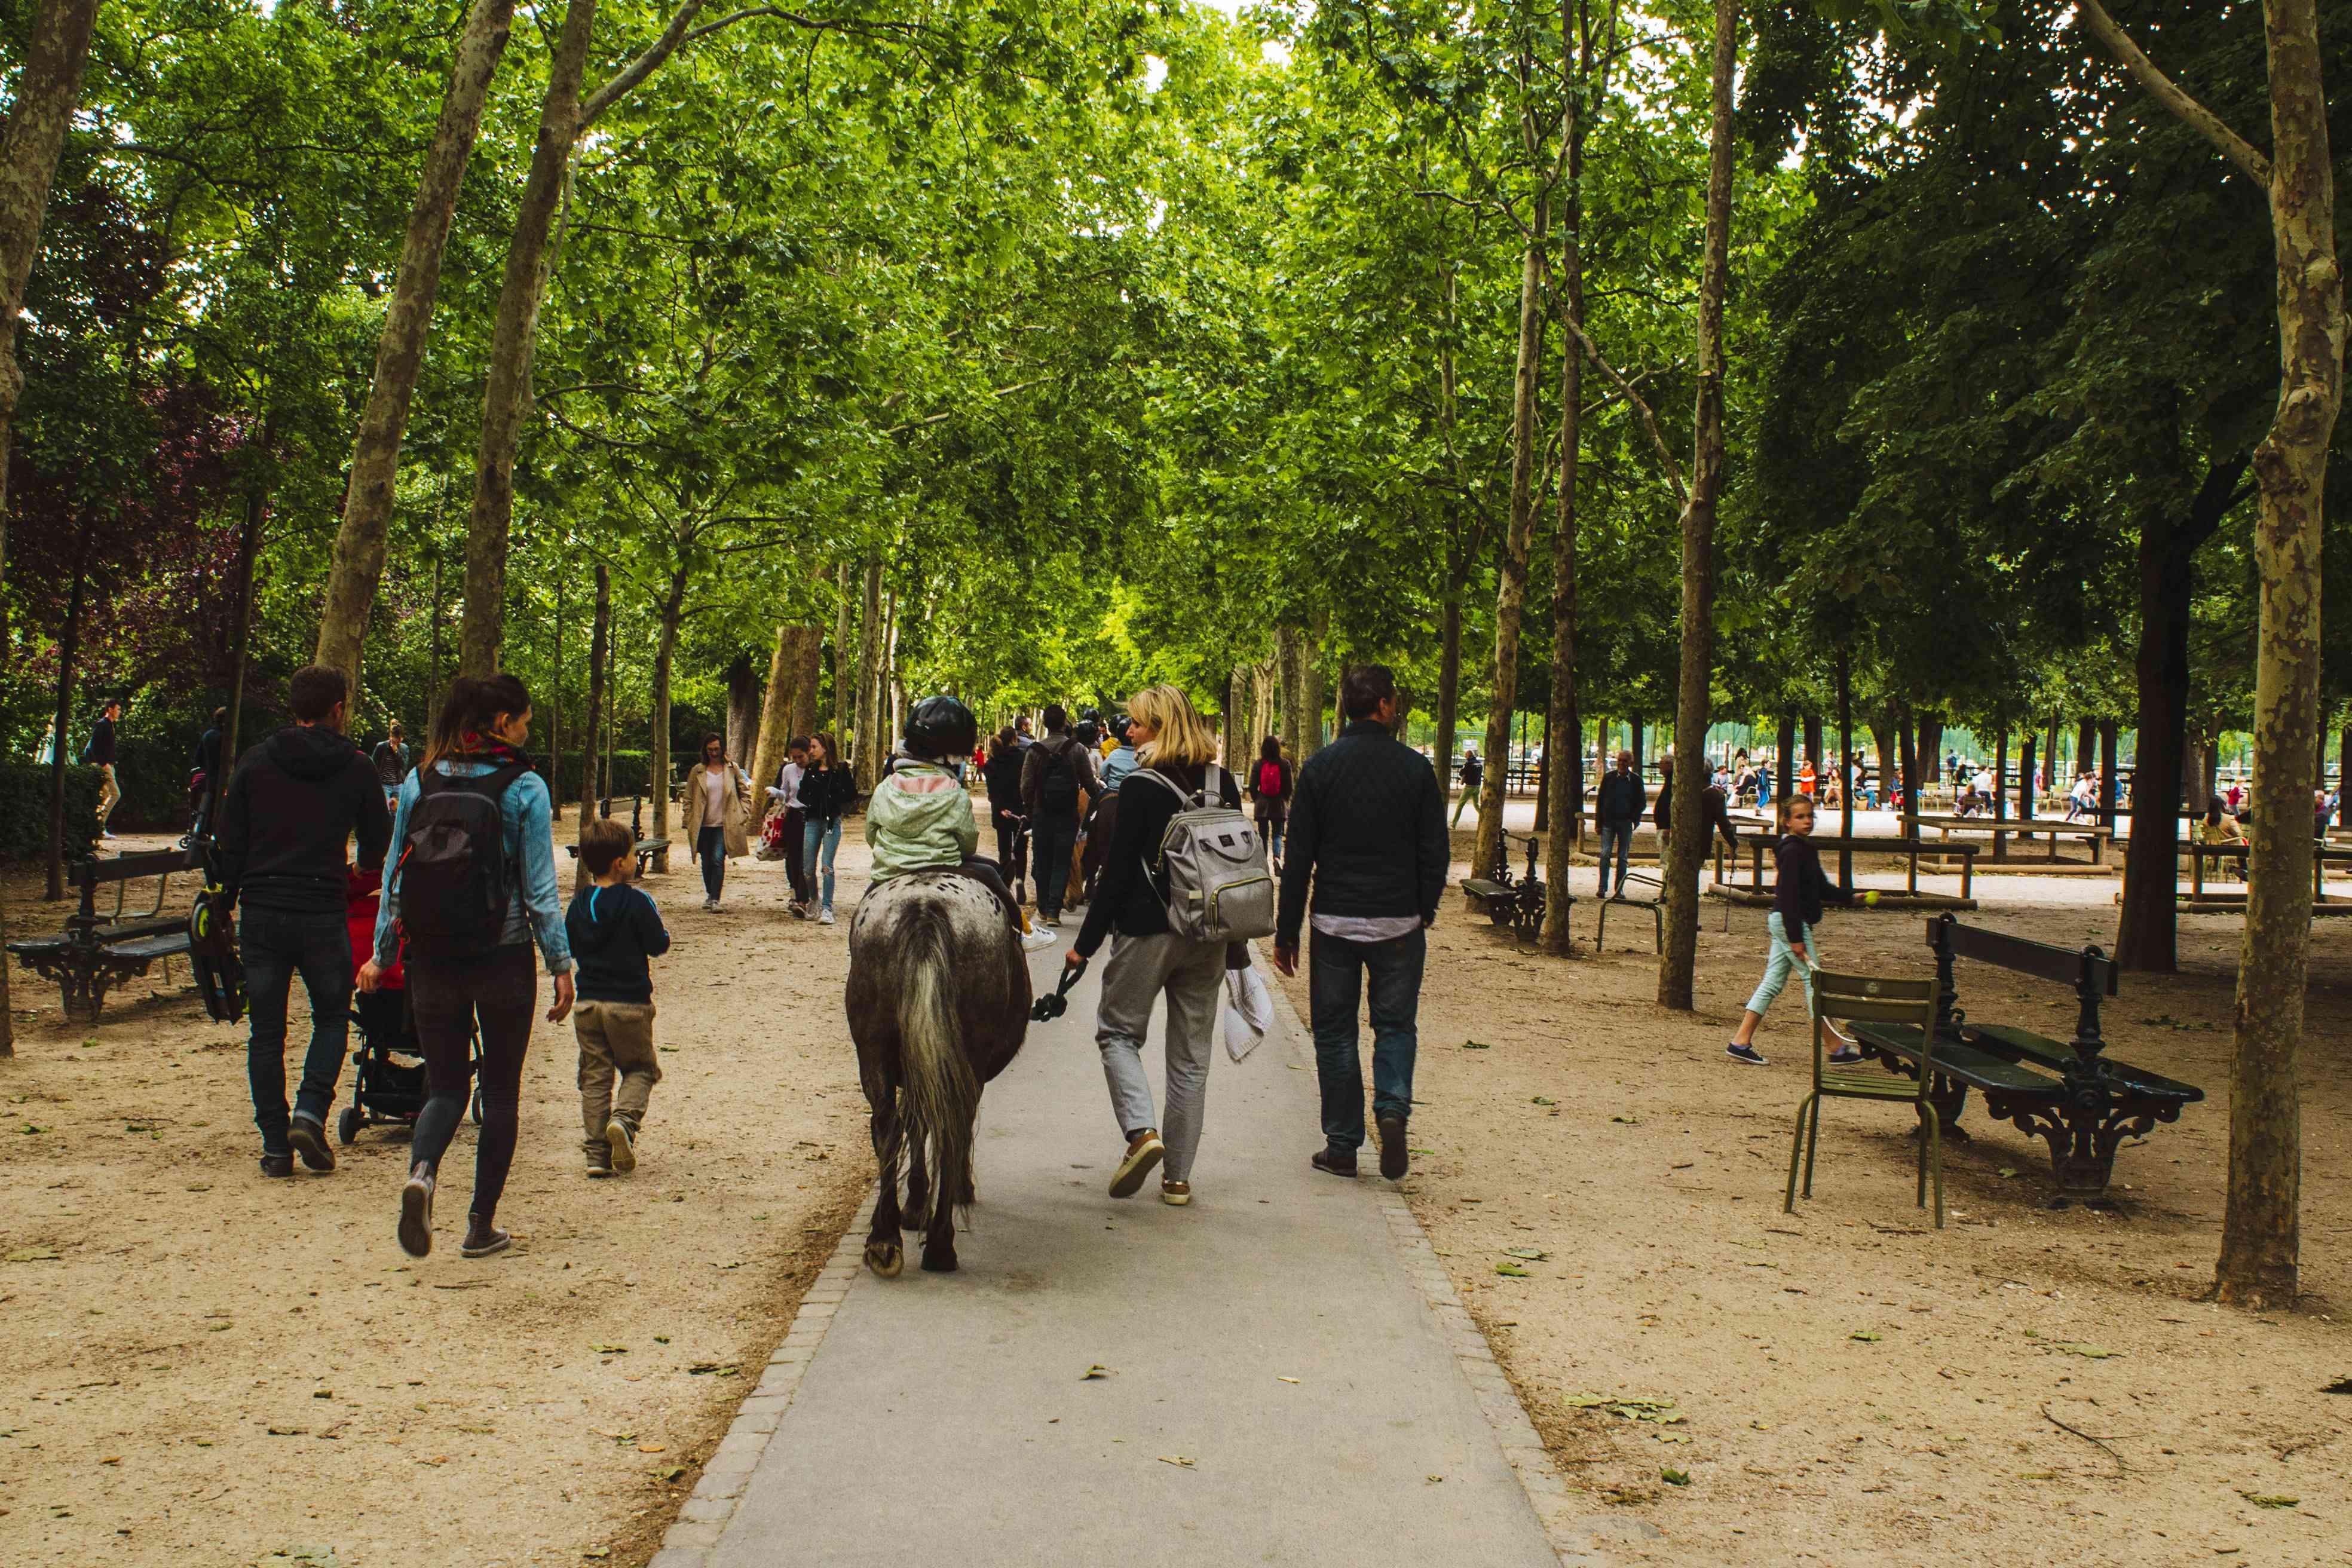 Kids riding ponies in Luxembourg garden